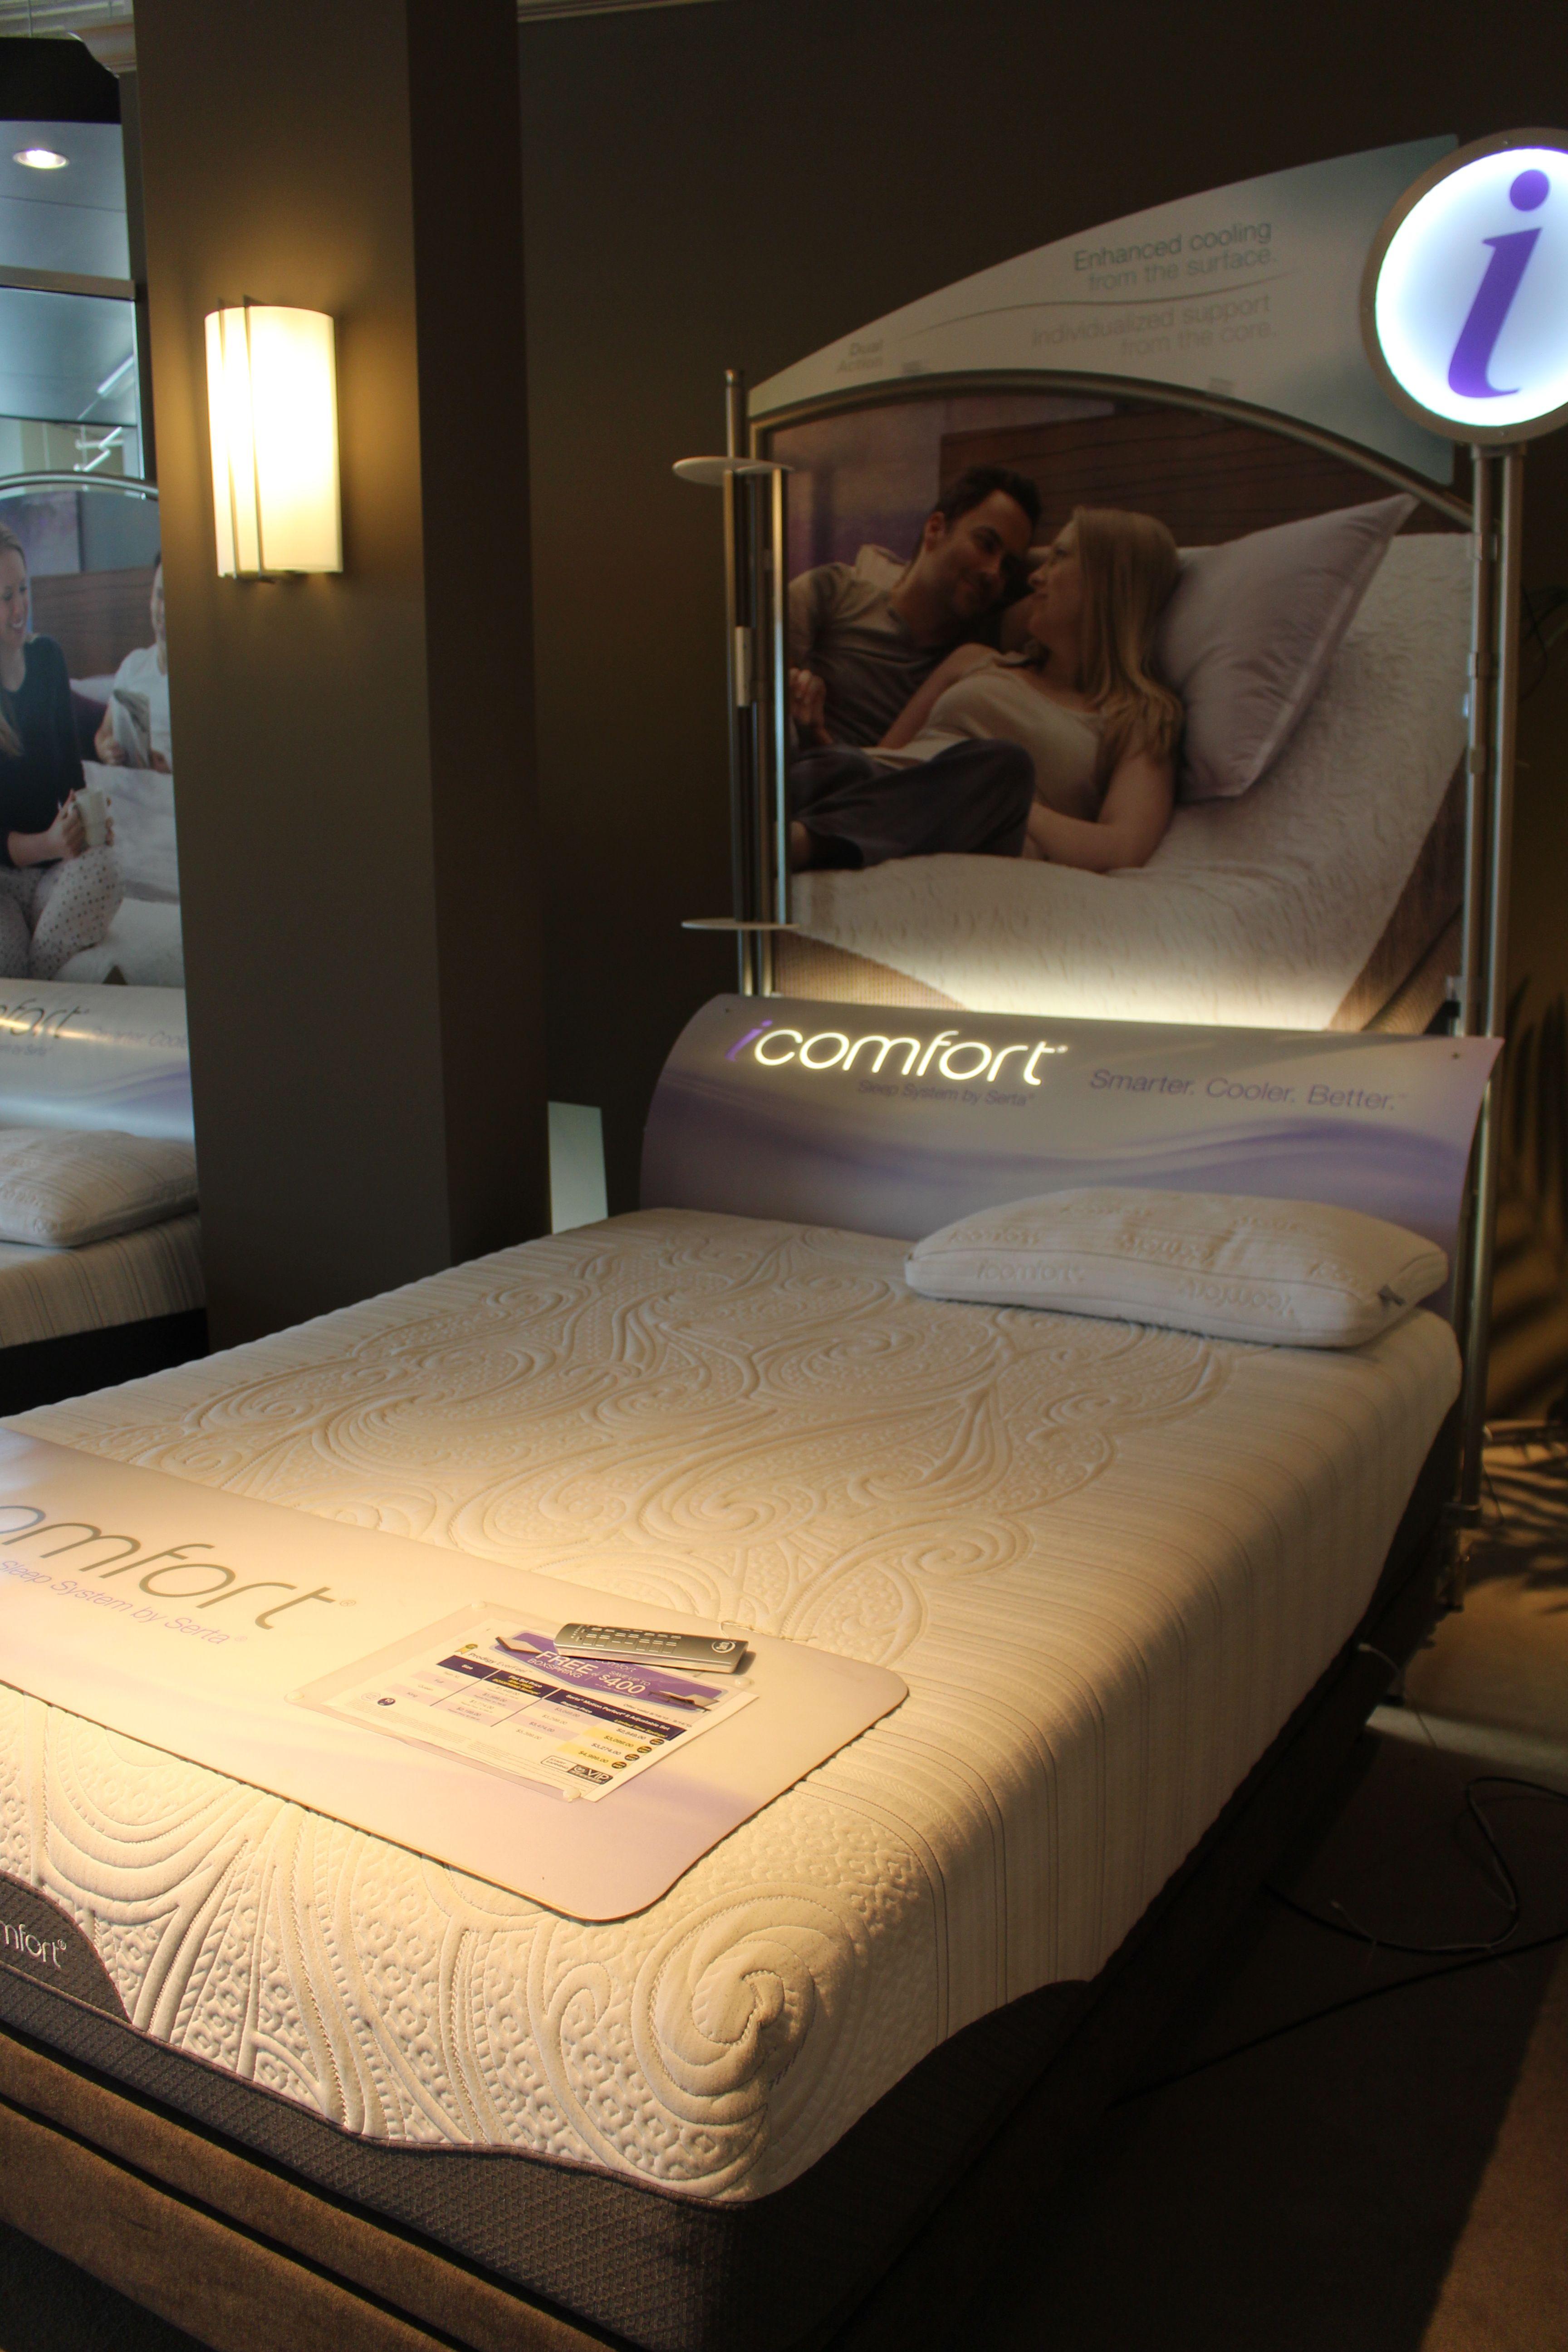 Exceptionnel #Cardis #Furniture #CardisFurniture #Mattress #Bed #Beautyrest #sleep  #comfort